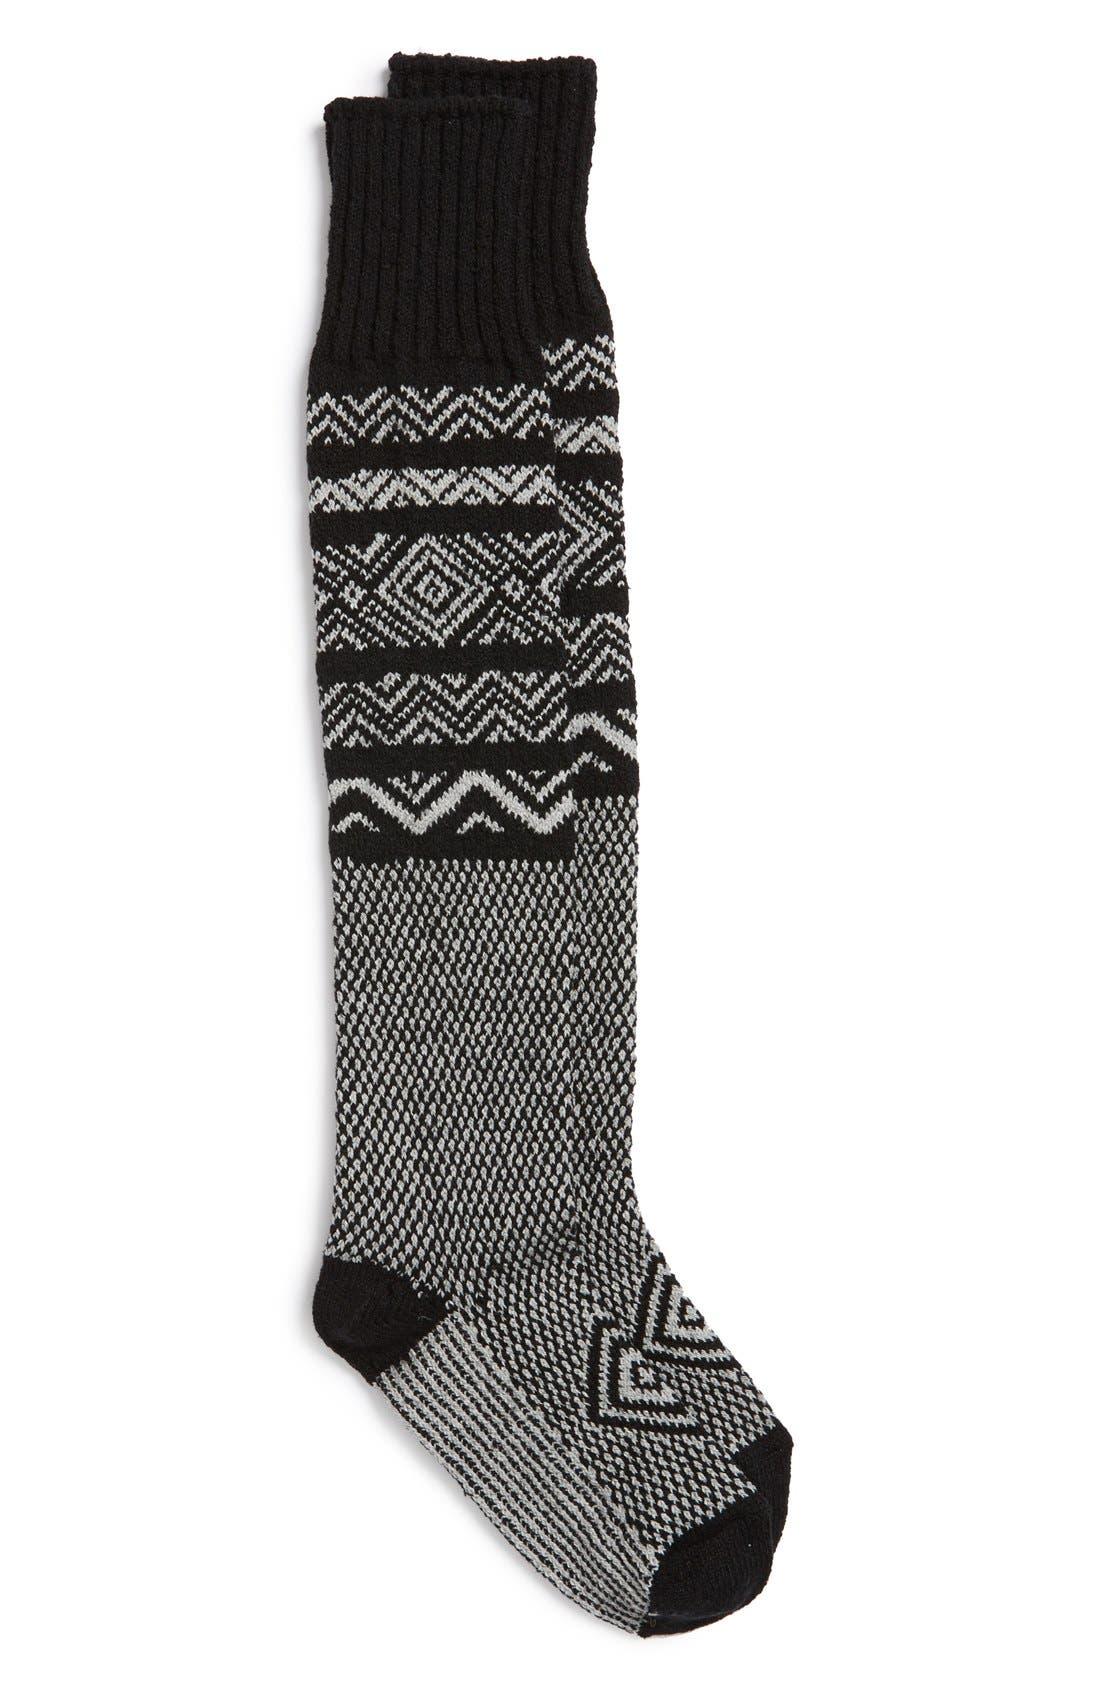 Alternate Image 1 Selected - Peony & Moss Scandinavian Knee High Socks